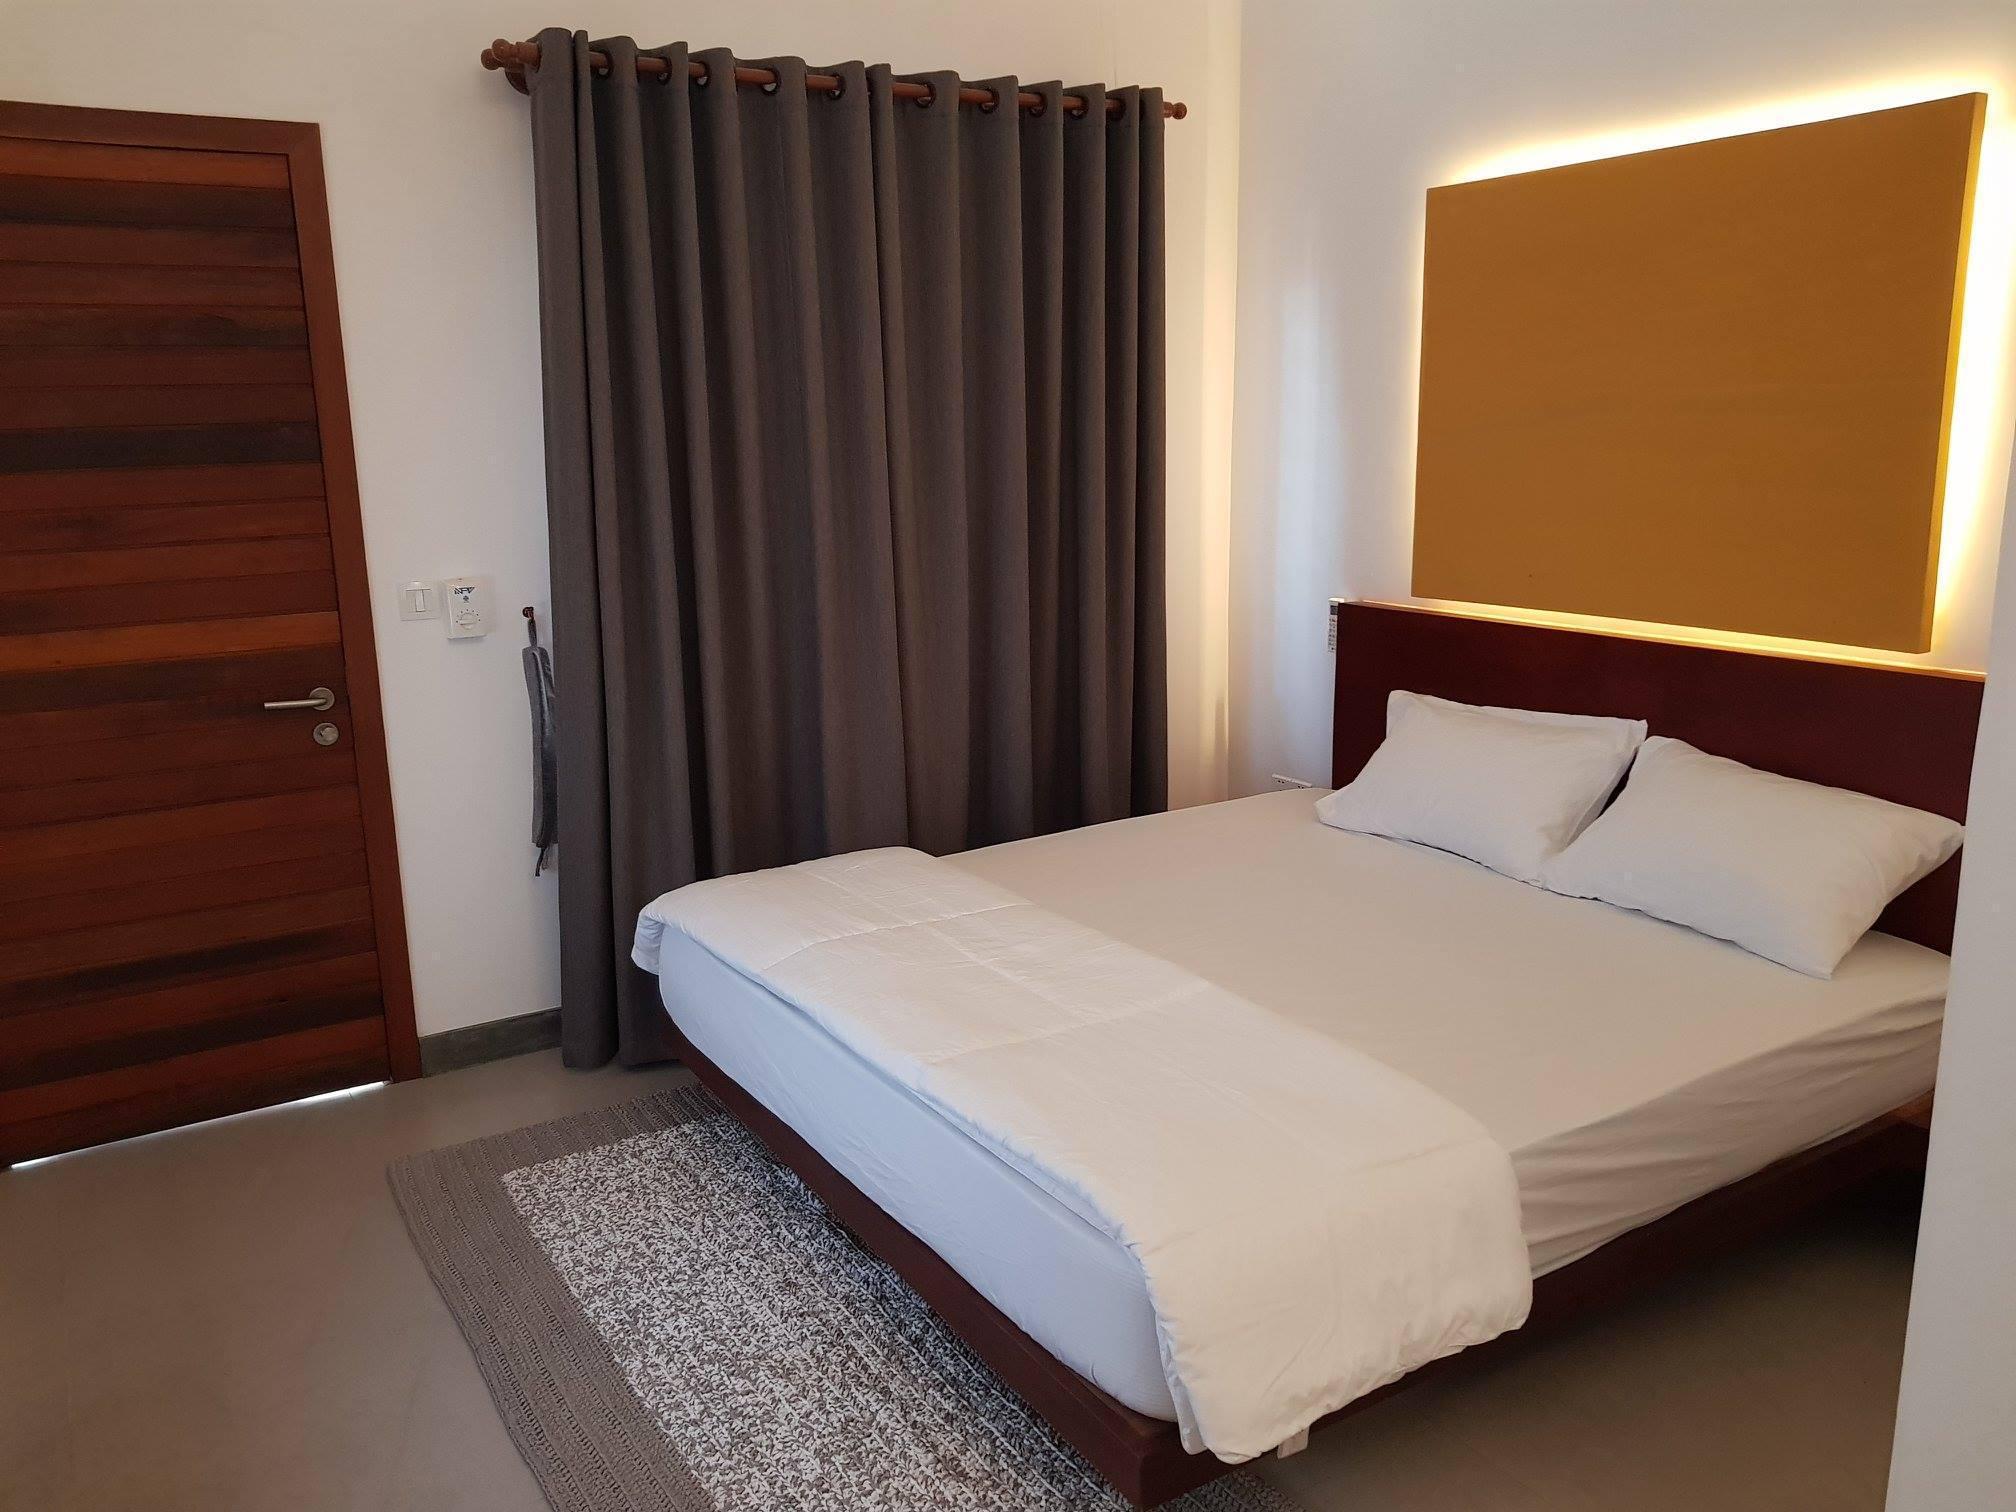 STUDIO-05 Phan NaTa Apartment